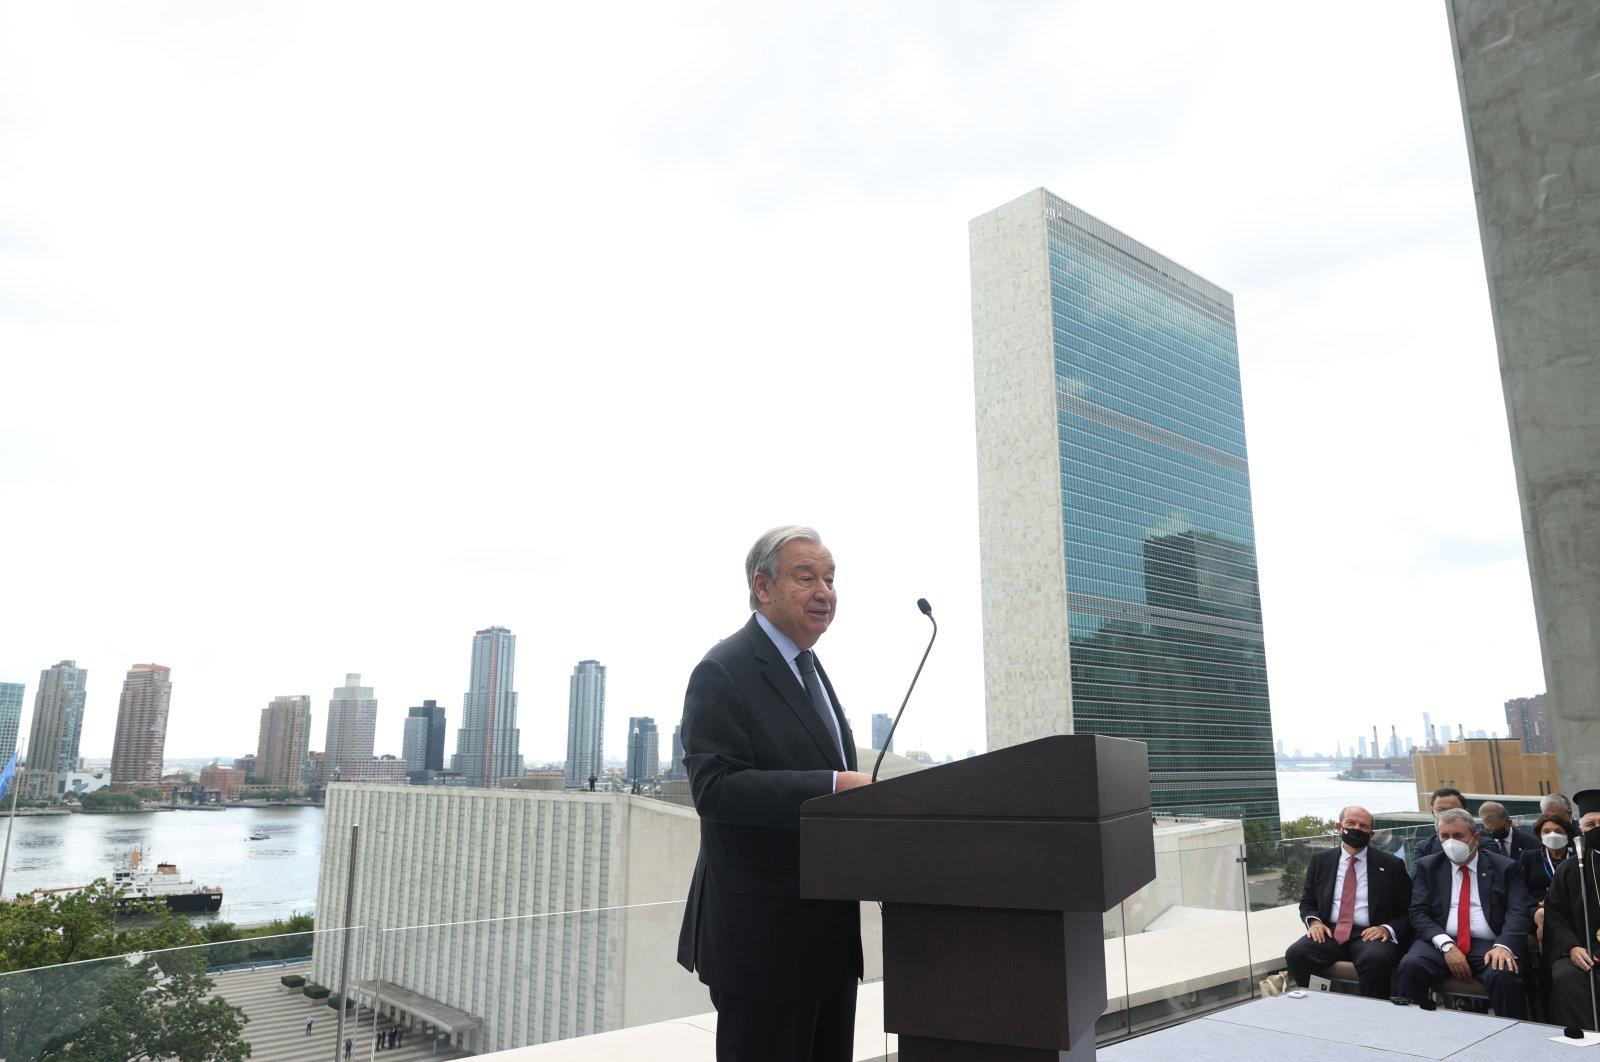 U.N. Secretary-General Antonio Guterres speaks during the opening ceremony of the new Turkish House (Türkevi) in New York City, New York, U.S., on Sept. 20, 2021. (AA Photo)